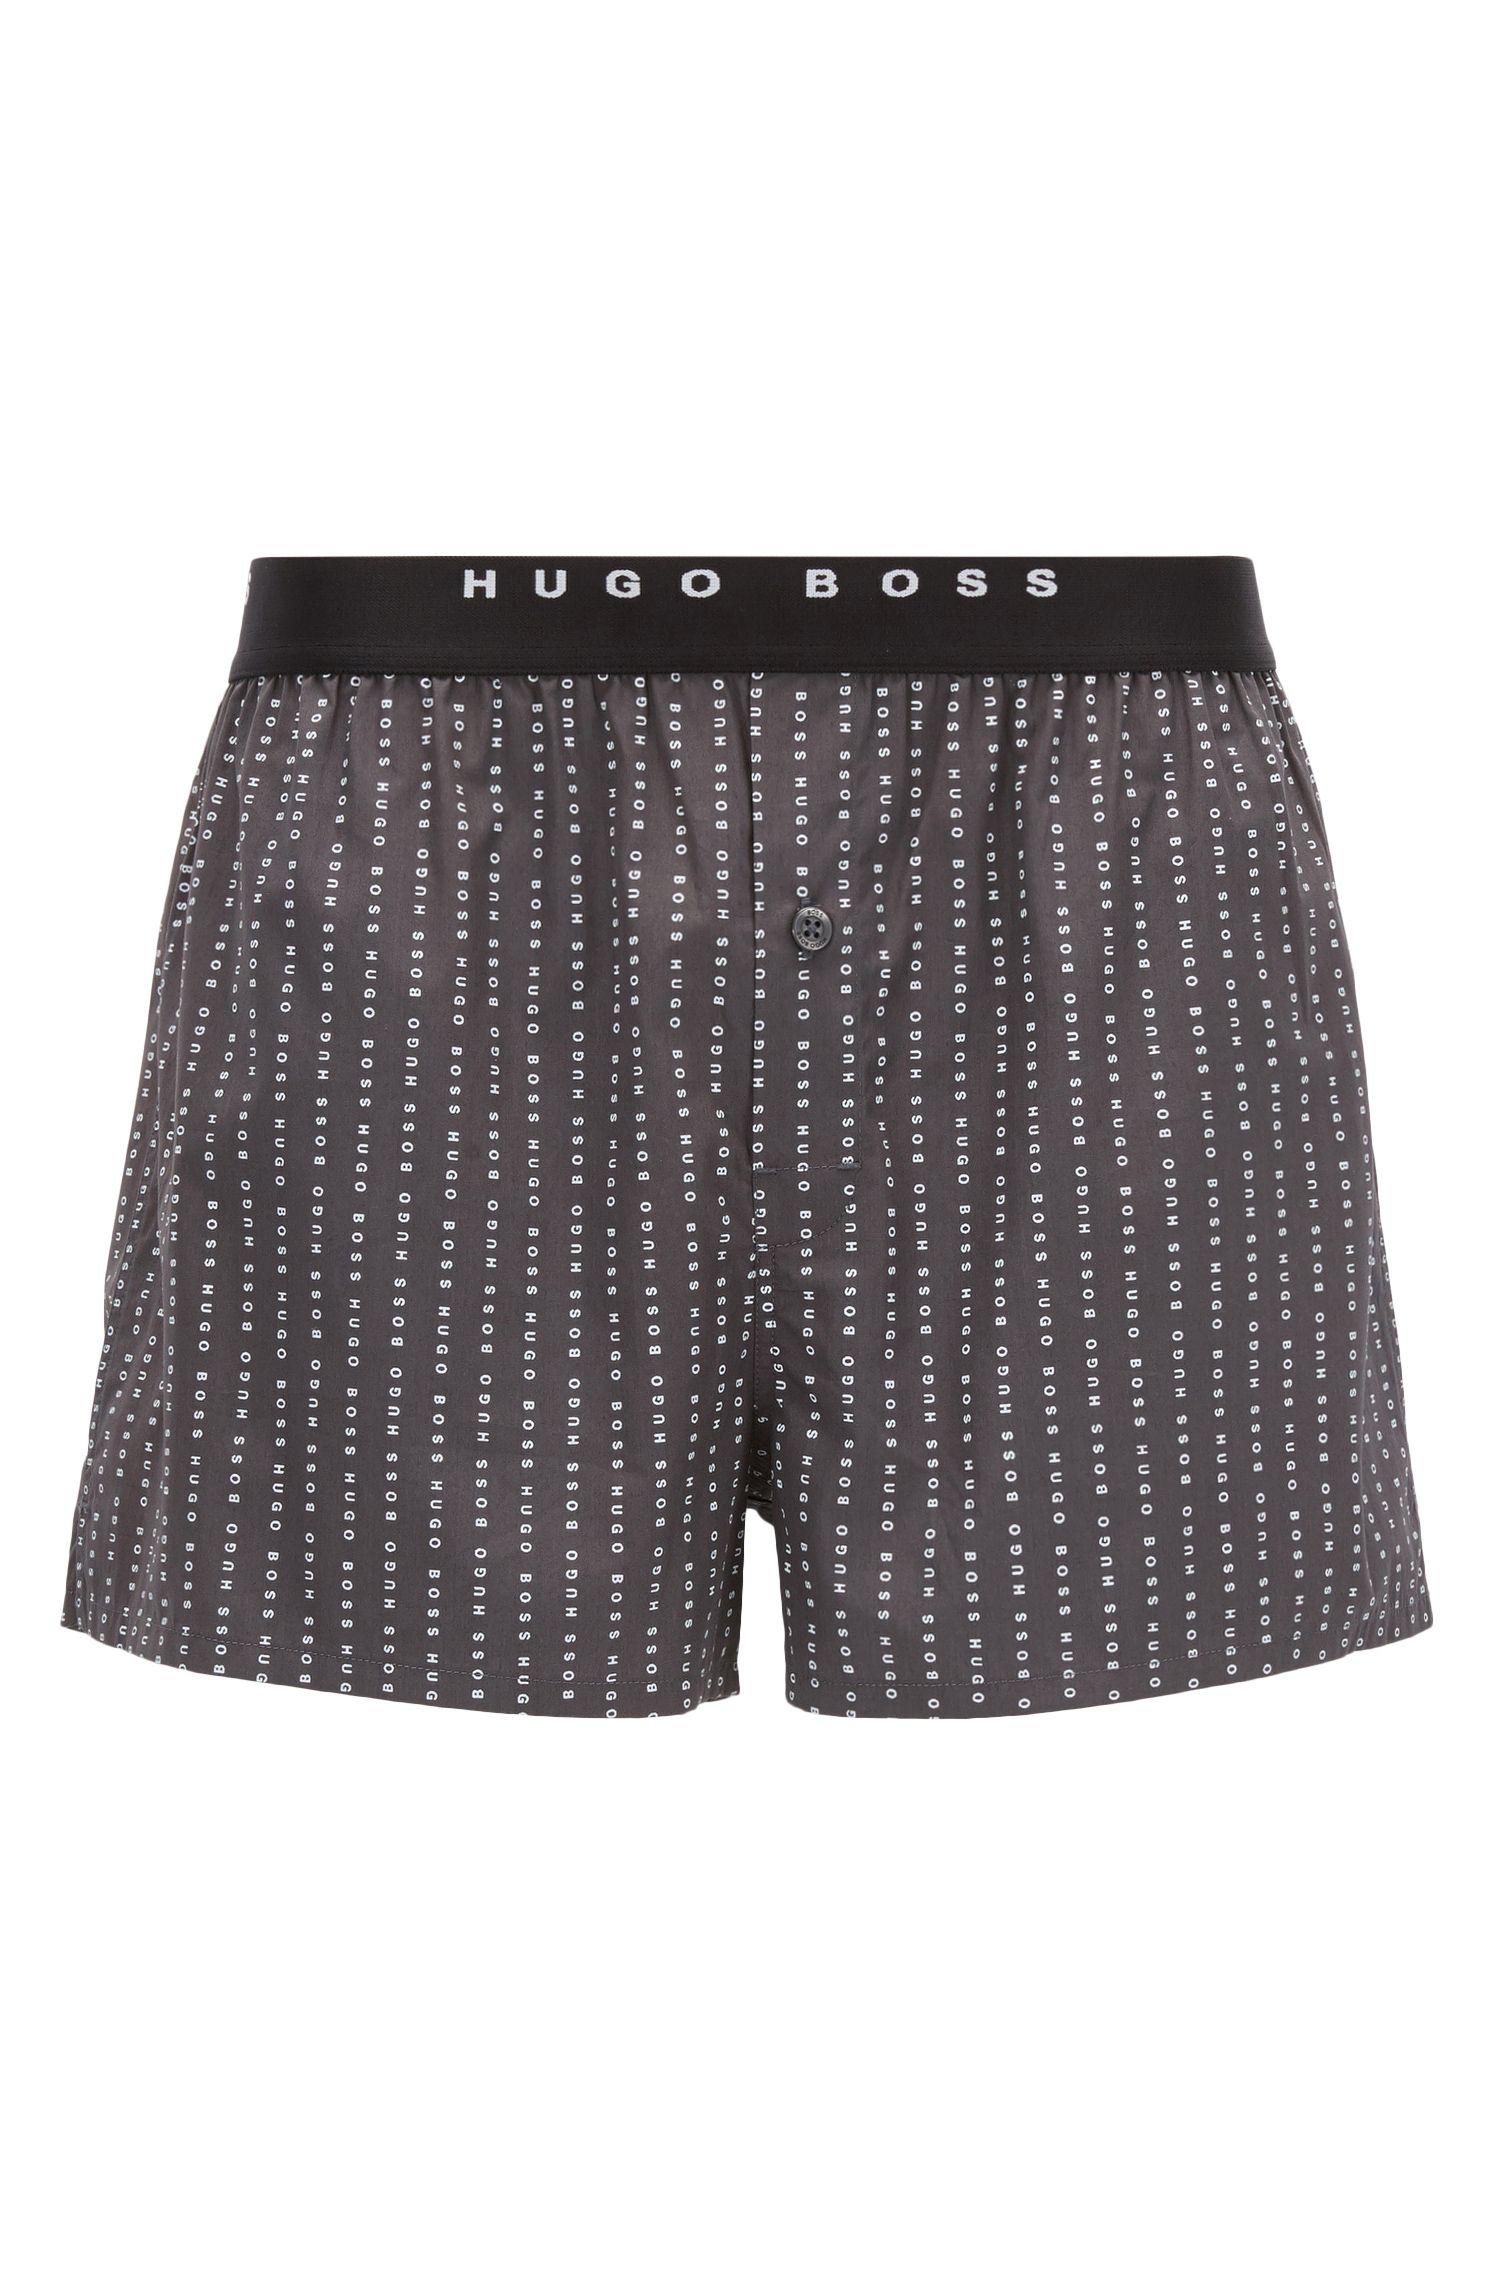 Shorts ligeros de pijama en popelín de algodón